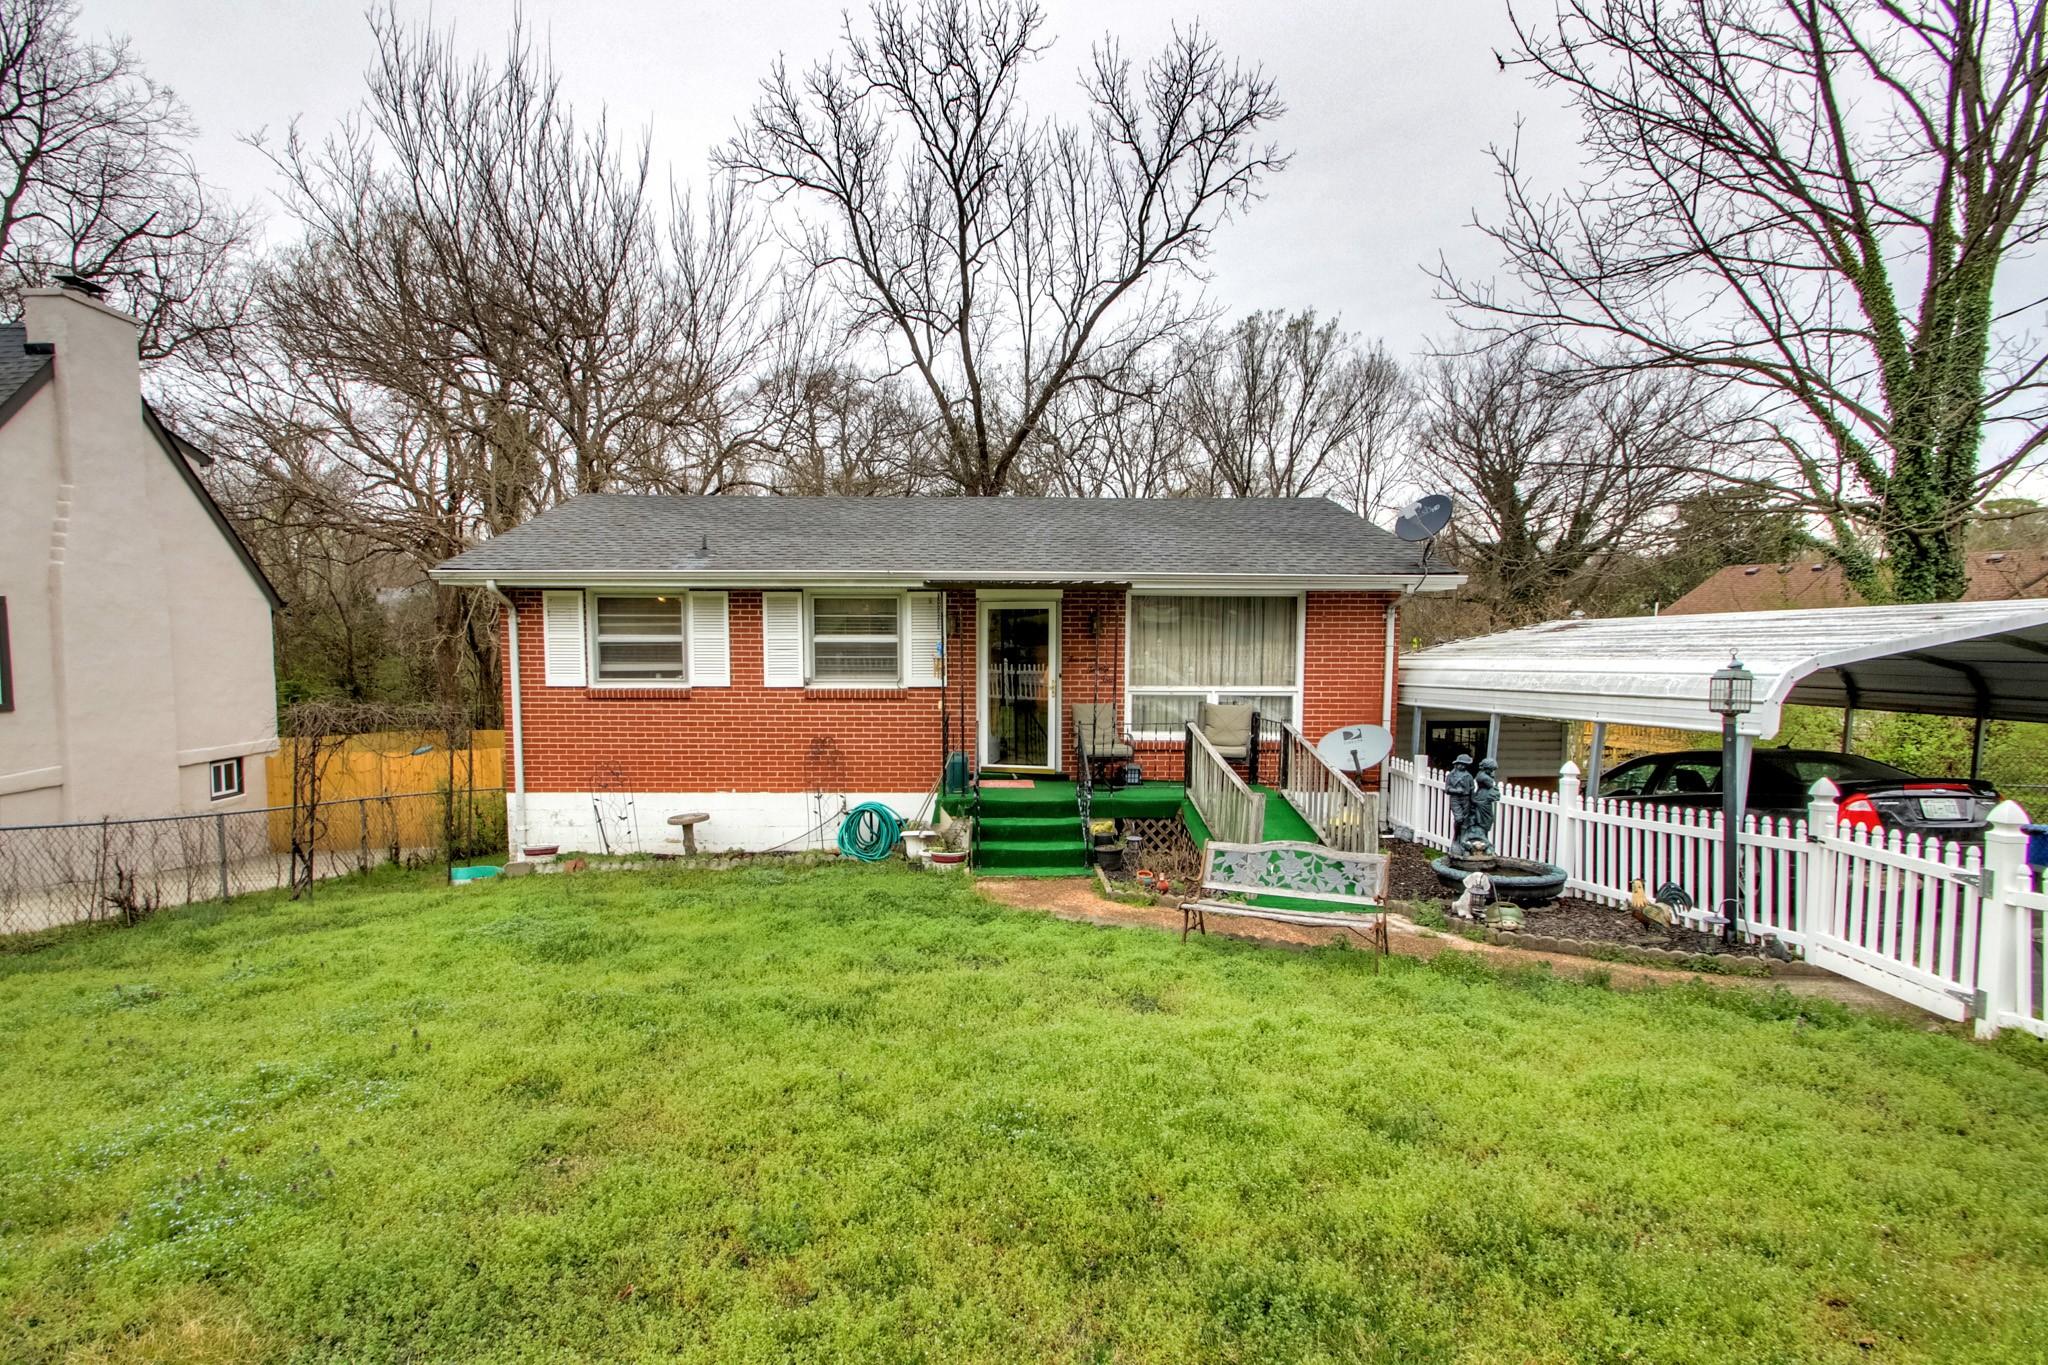 1424 Kirkland Ave, Nashville, TN 37216 - Nashville, TN real estate listing